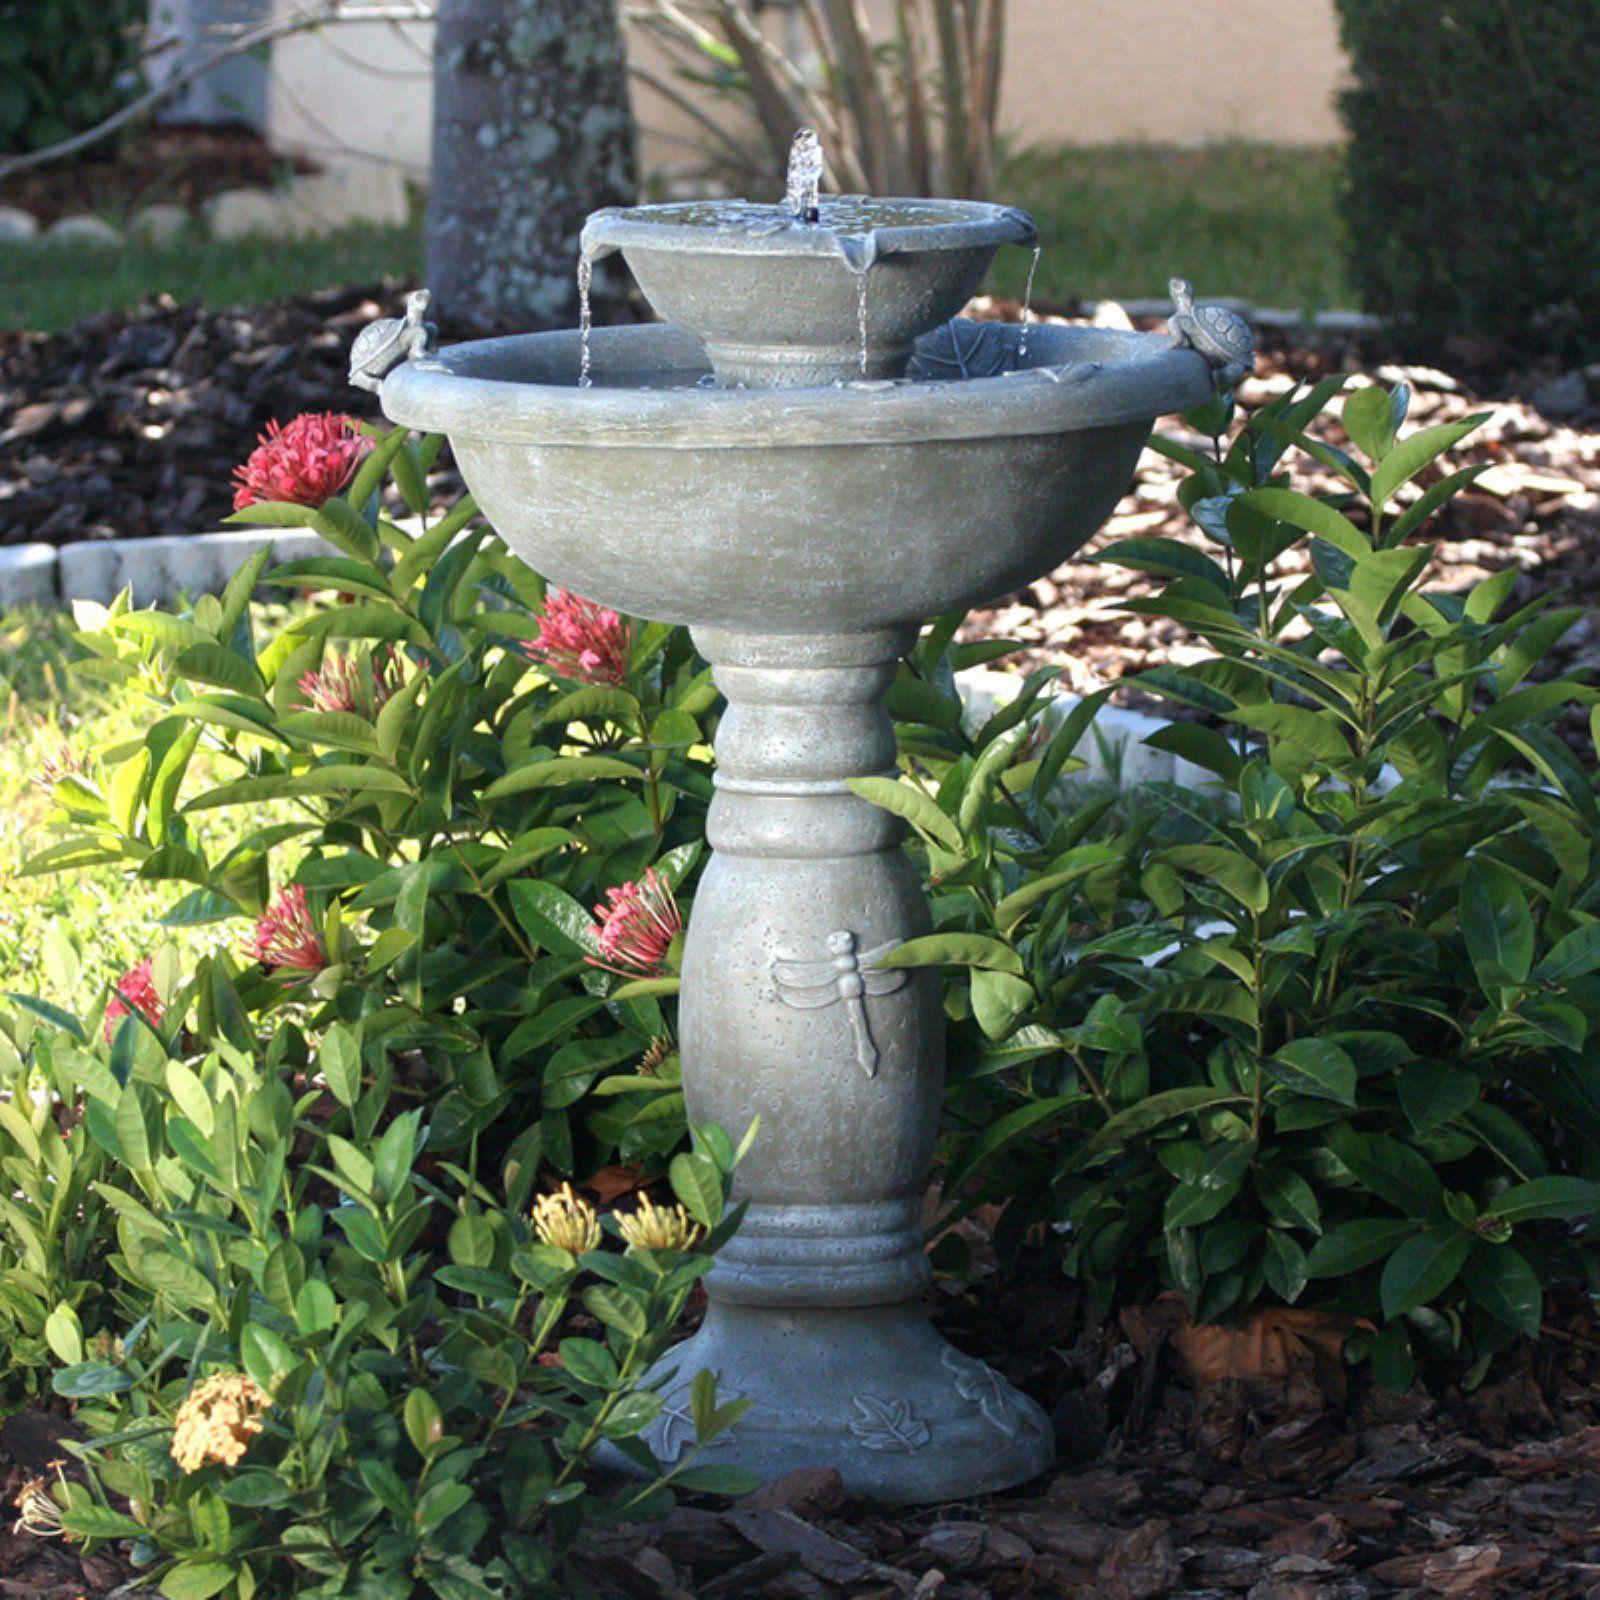 6f8eca3d573c2c09c4b41c63b6734002 - Smart Solar Gardens 2 Tier Solar On Demand Fountain